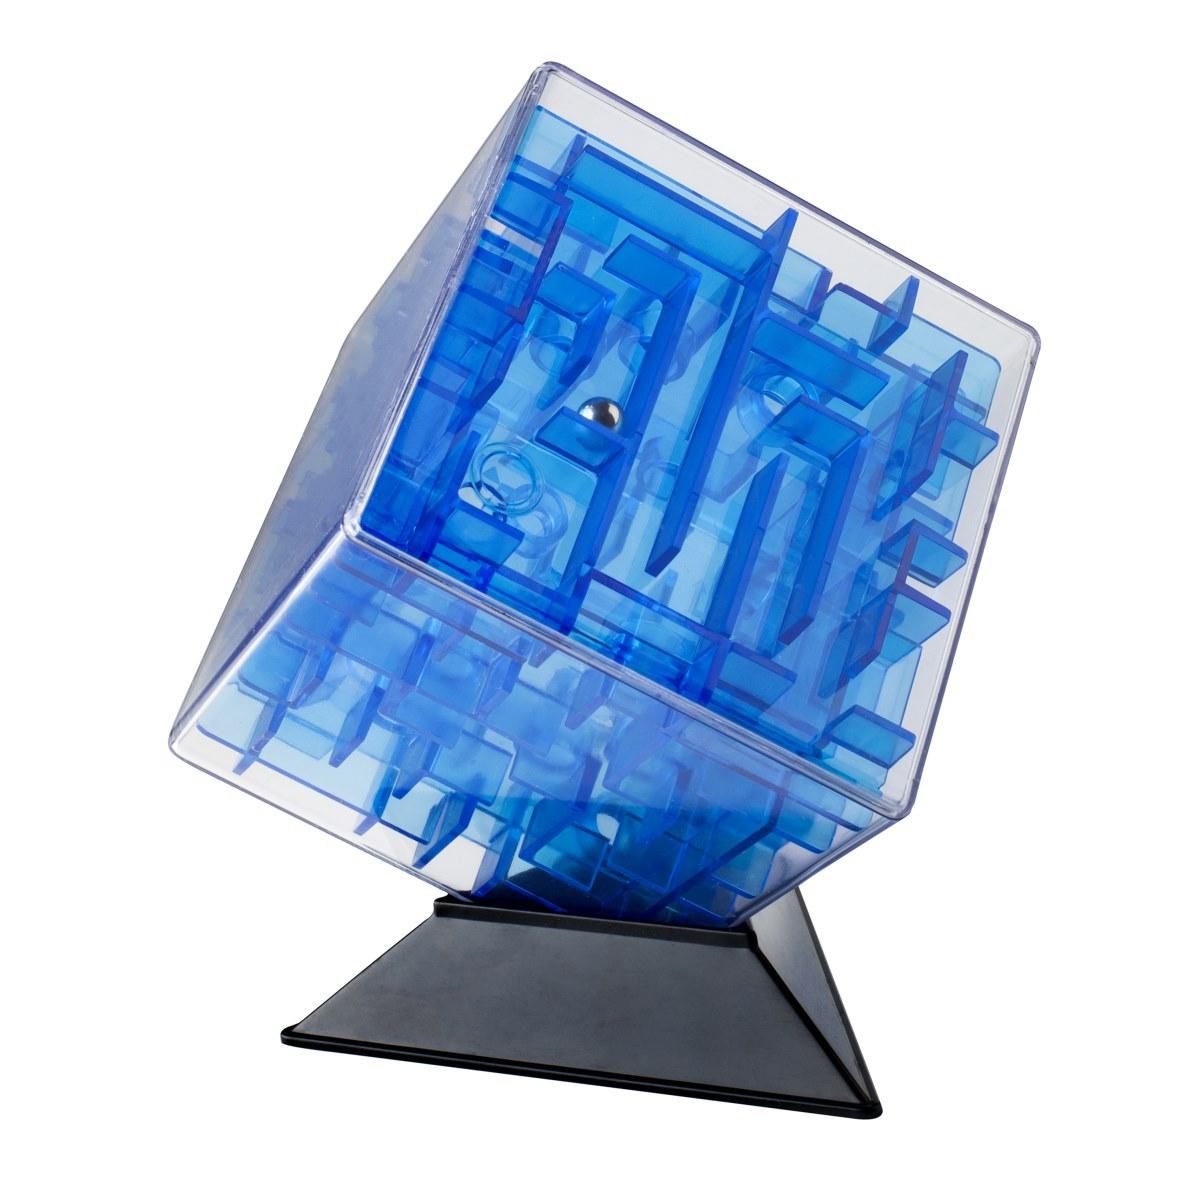 Головоломка из серии Лабиринтус  Куб, 10 см., синий, прозрачный - Головоломки, артикул: 149690